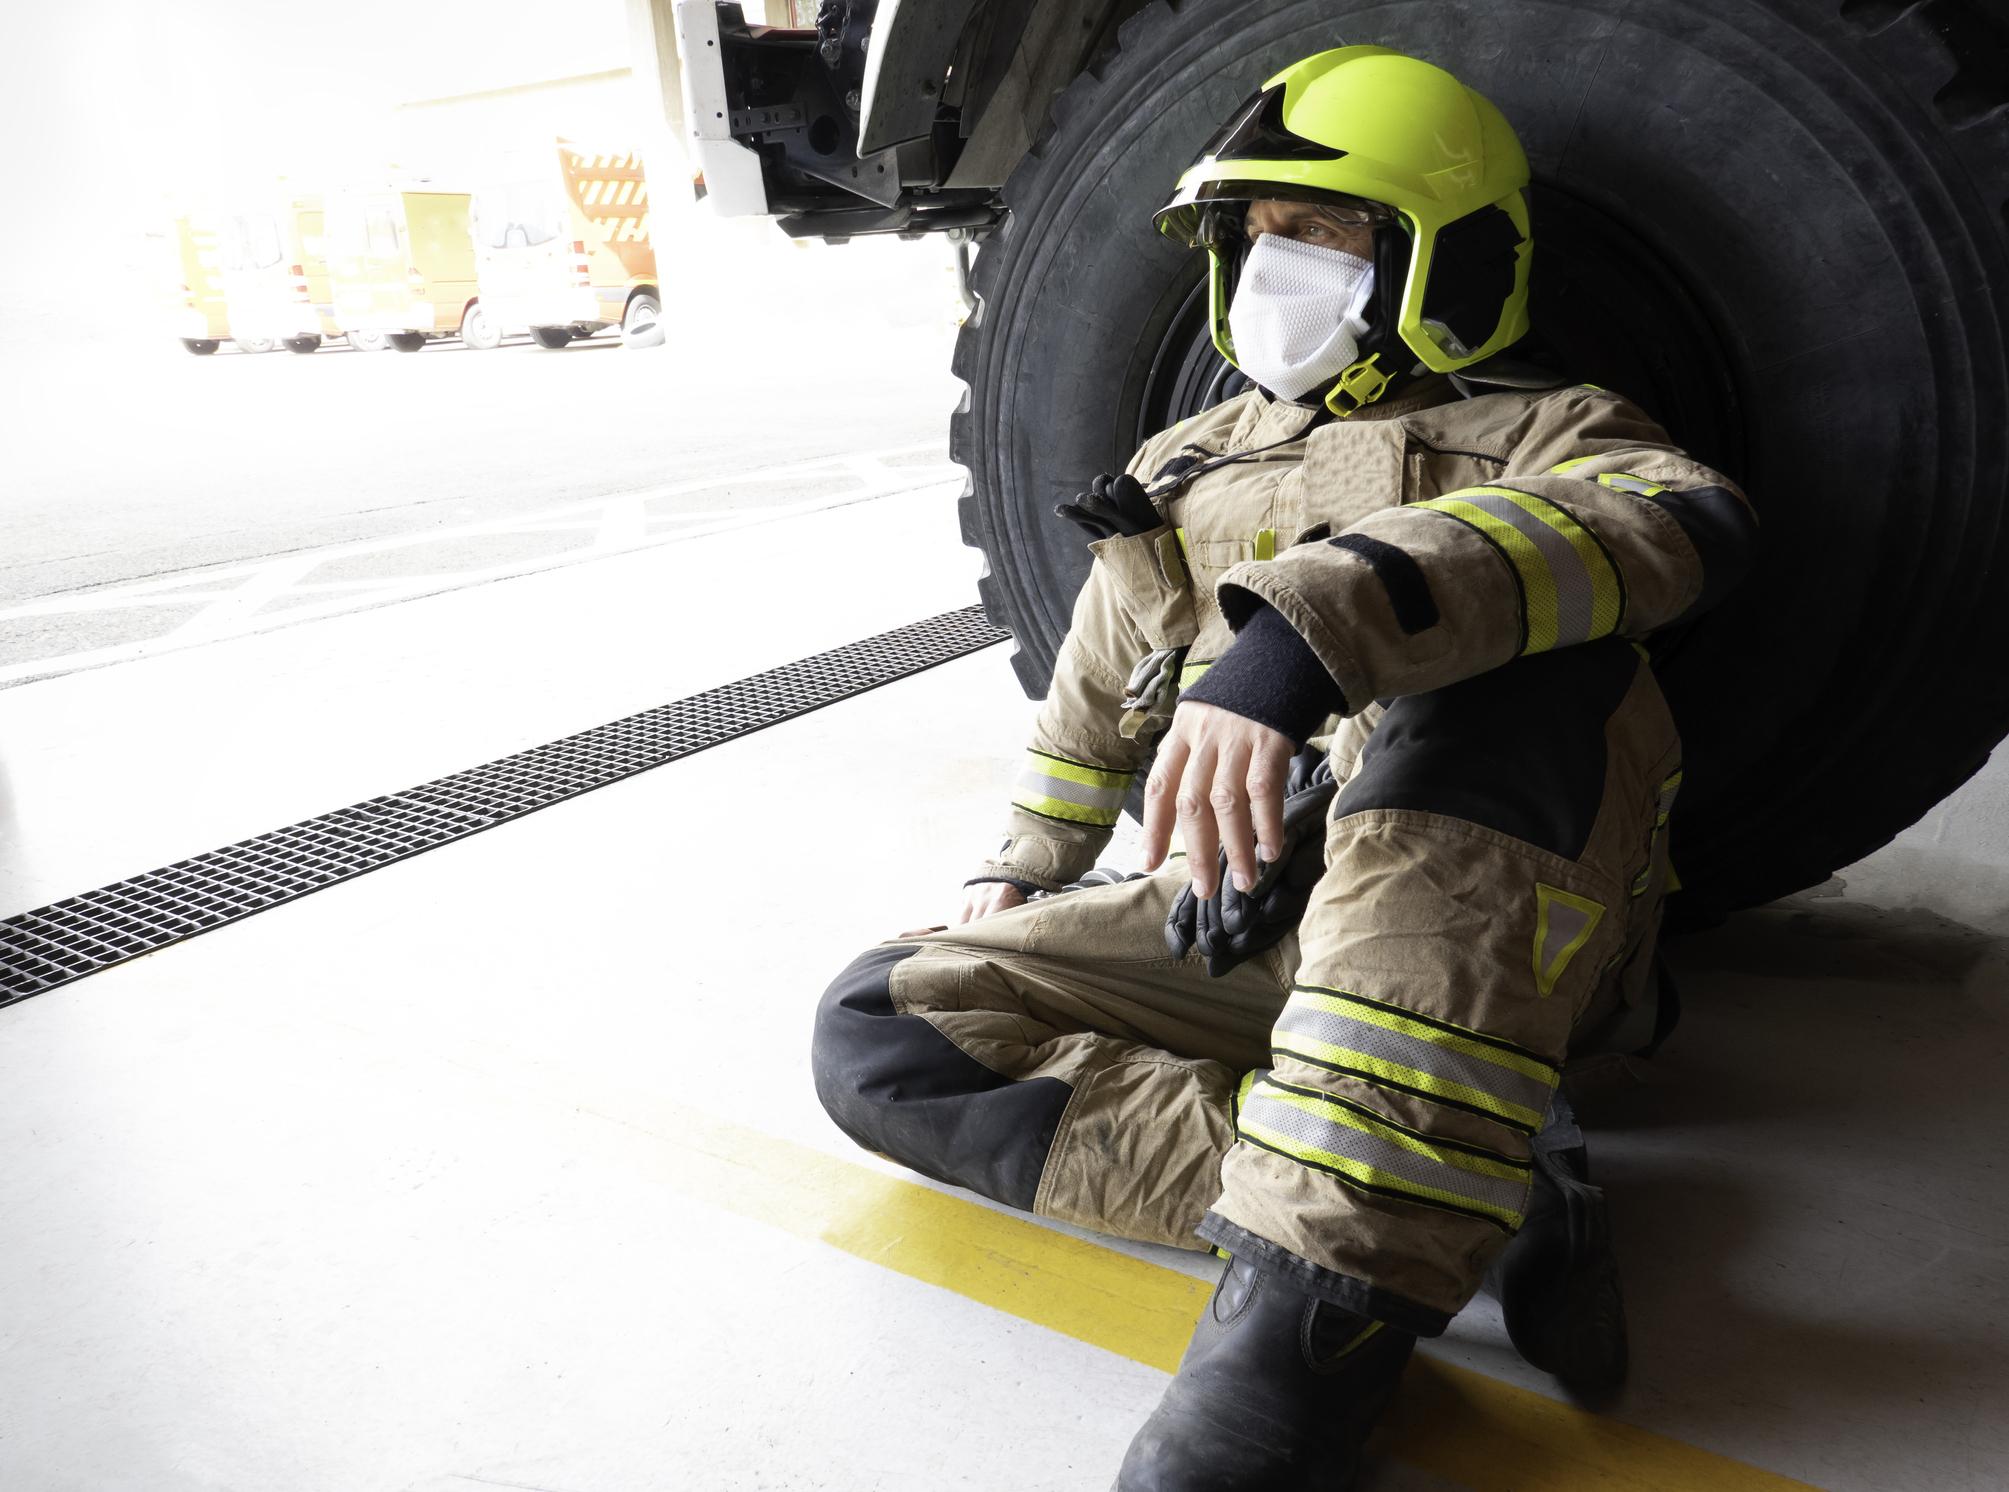 Firefighter leaning wheel